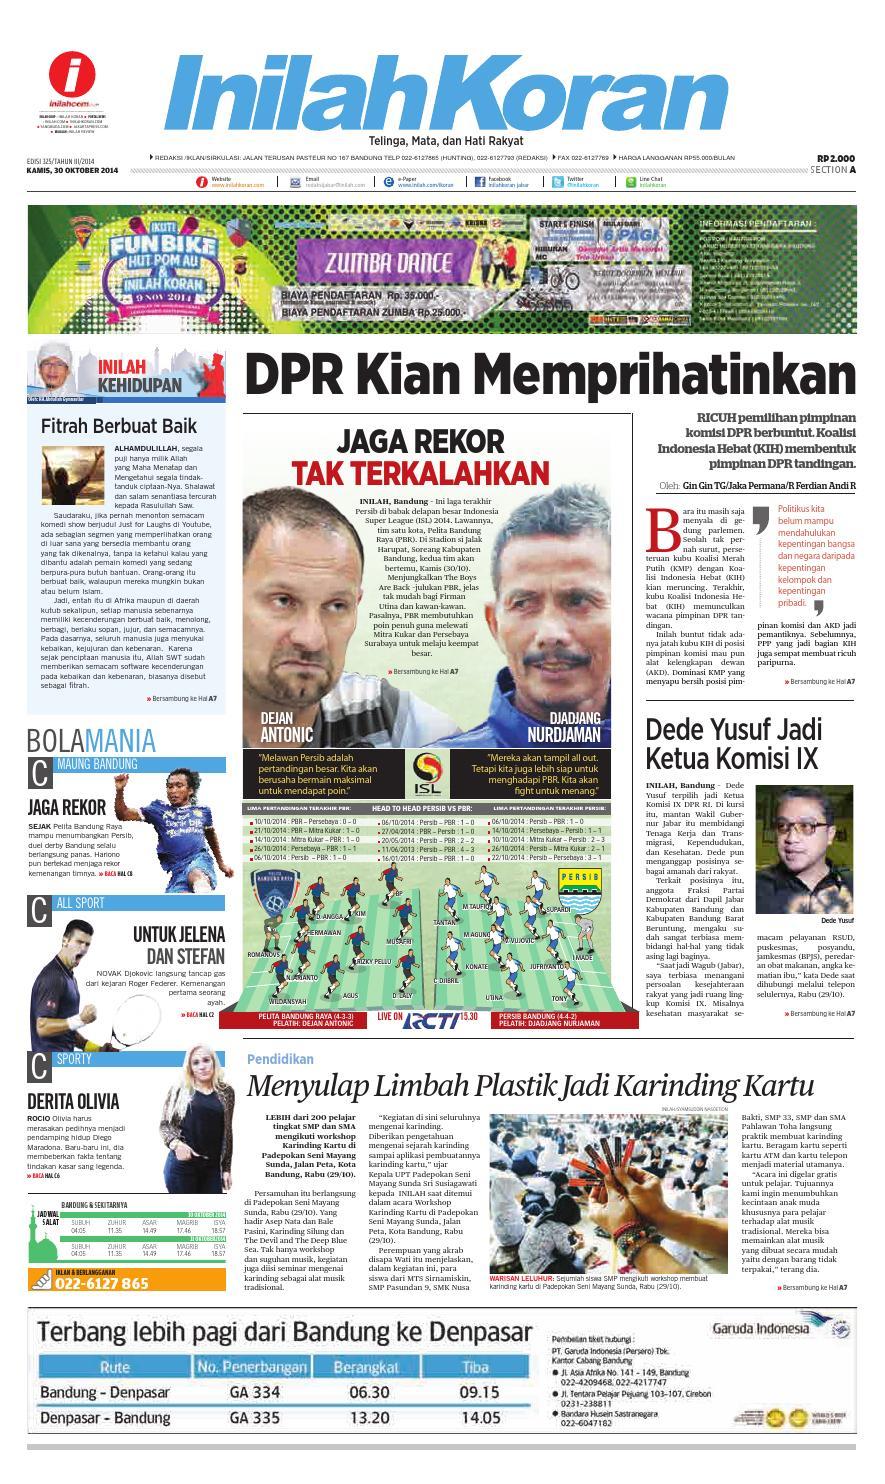 Dpr Kian Memprihatinkan By Inilah Media Jabar Issuu Produk Ukm Bumn Barbekyu Kelitik Surabaya